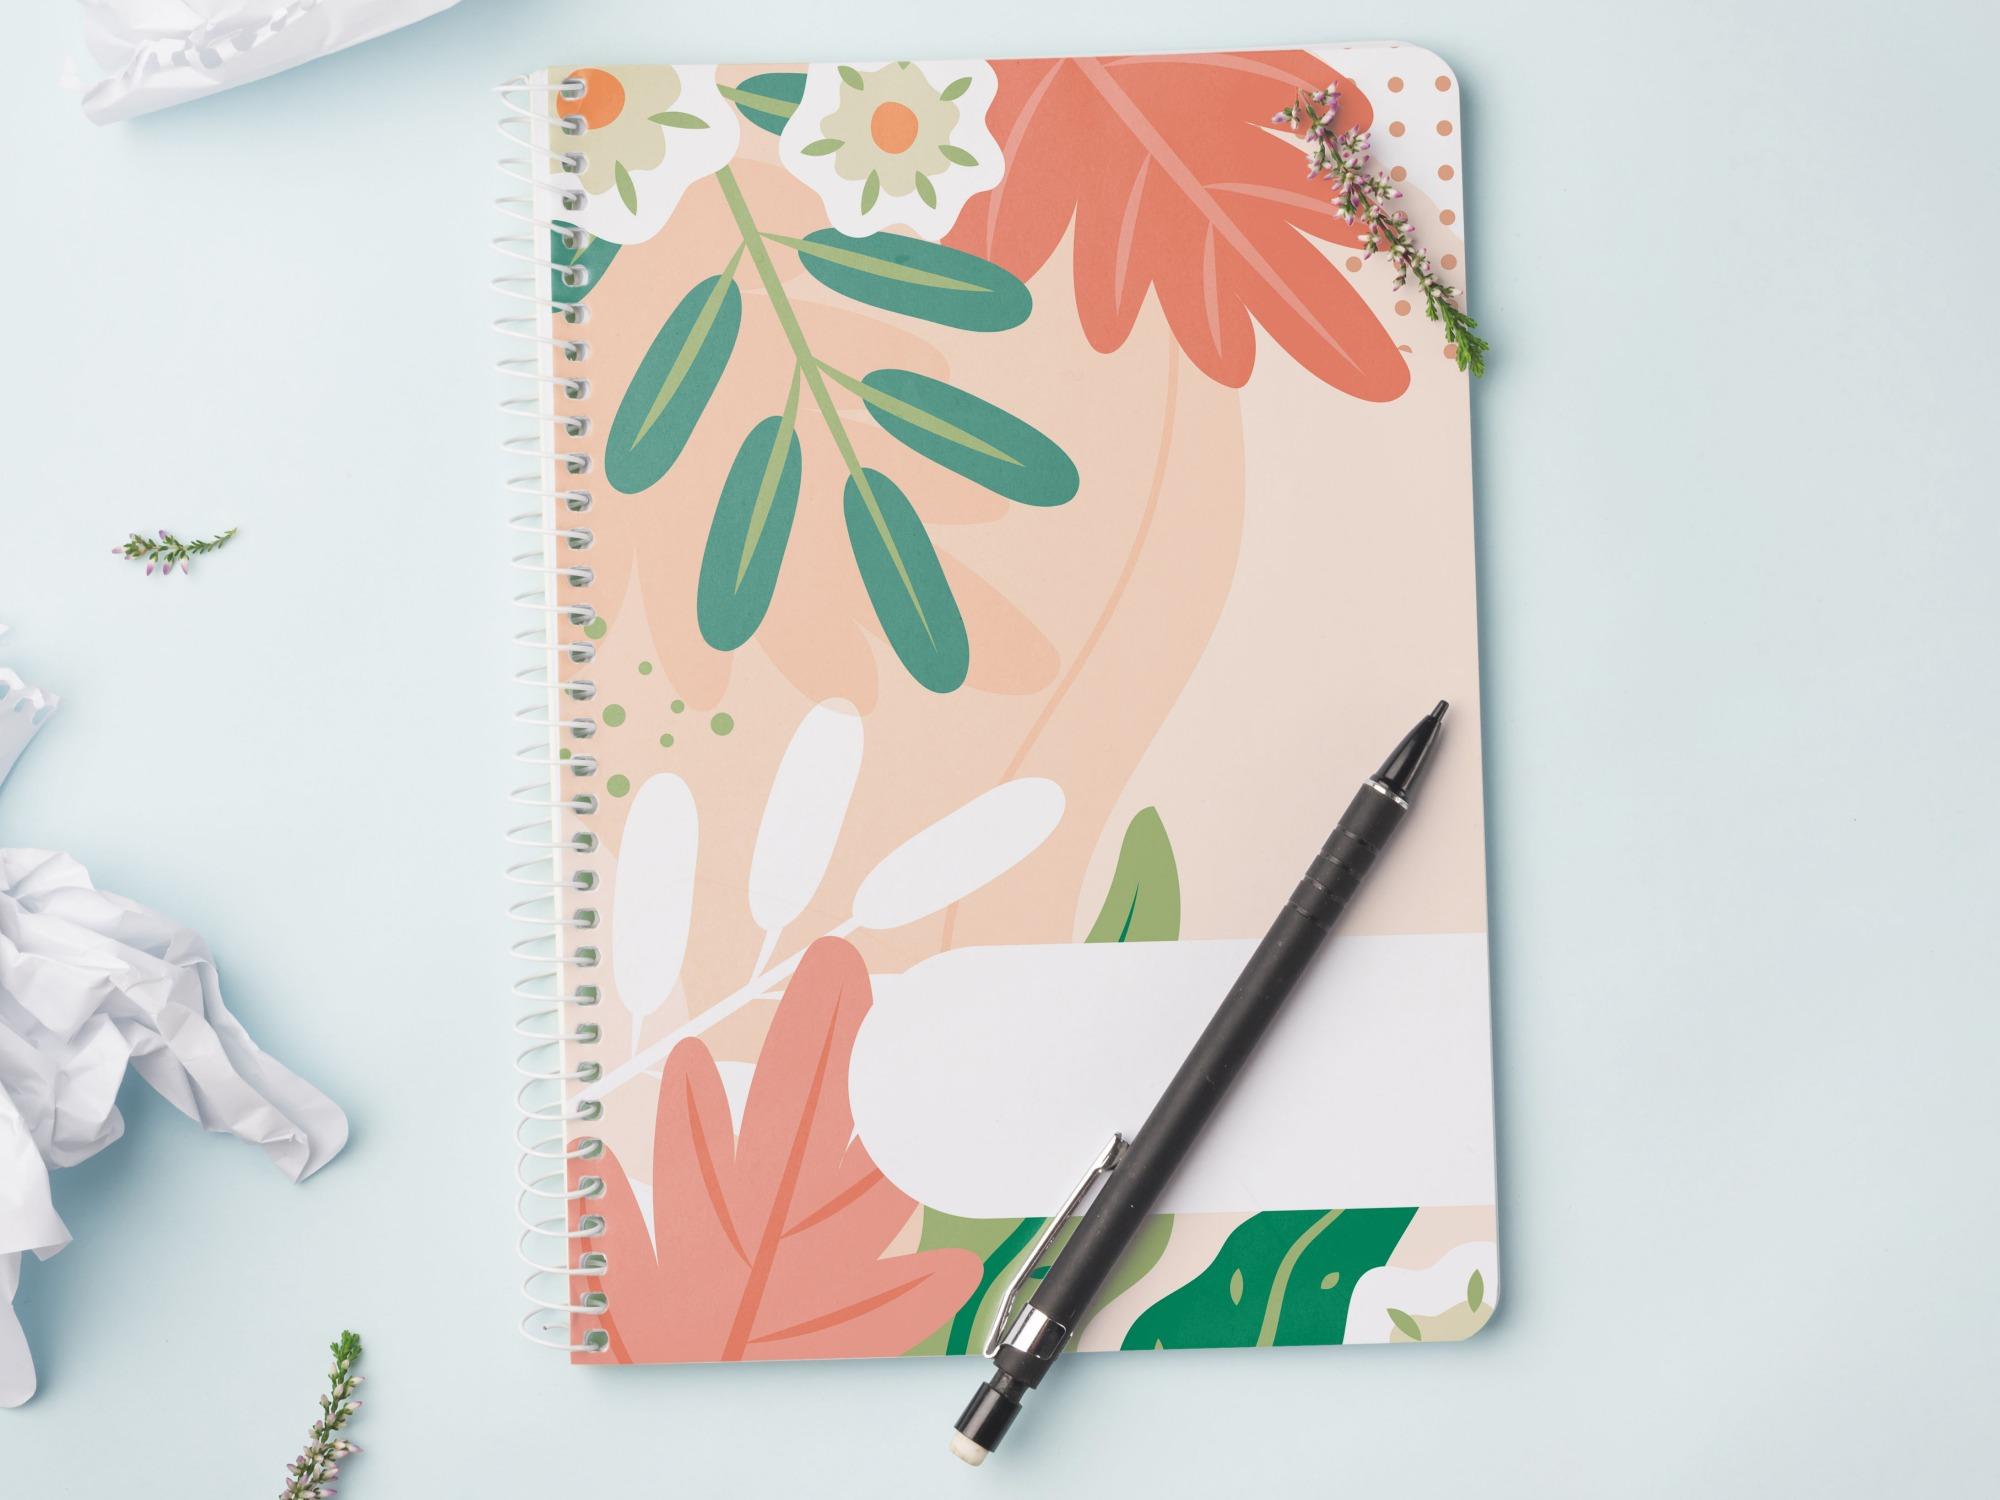 Shop spiral - Memo & Scratch Pads / Notebooks